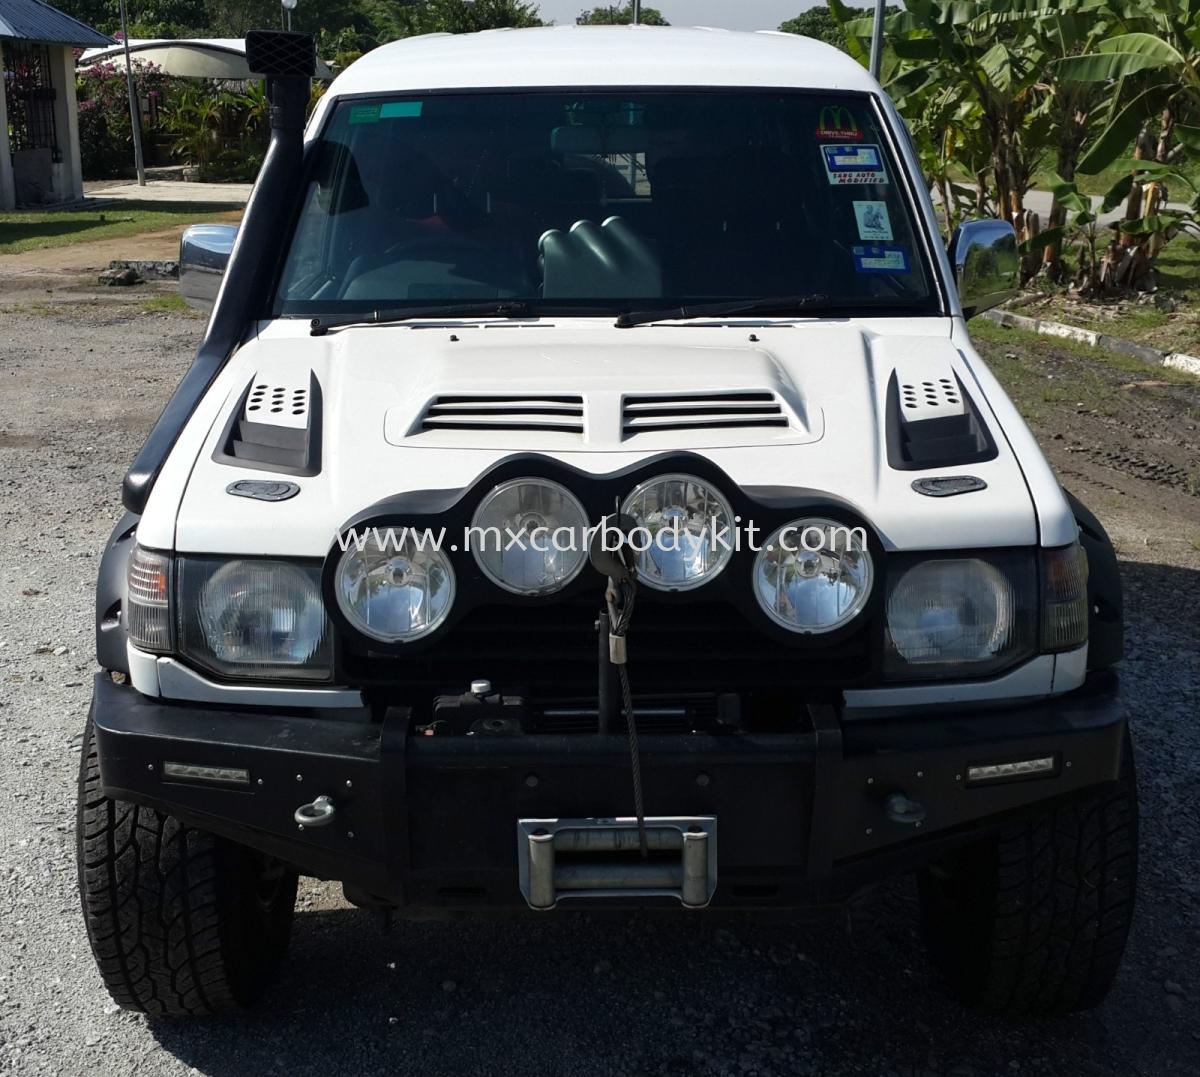 MITSUBISHI PAJERO FRONT BONNET PAJERO MITSUBISHI Johor, Malaysia, Johor Bahru (JB), Masai. Supplier, Suppliers, Supply, Supplies | MX Car Body Kit